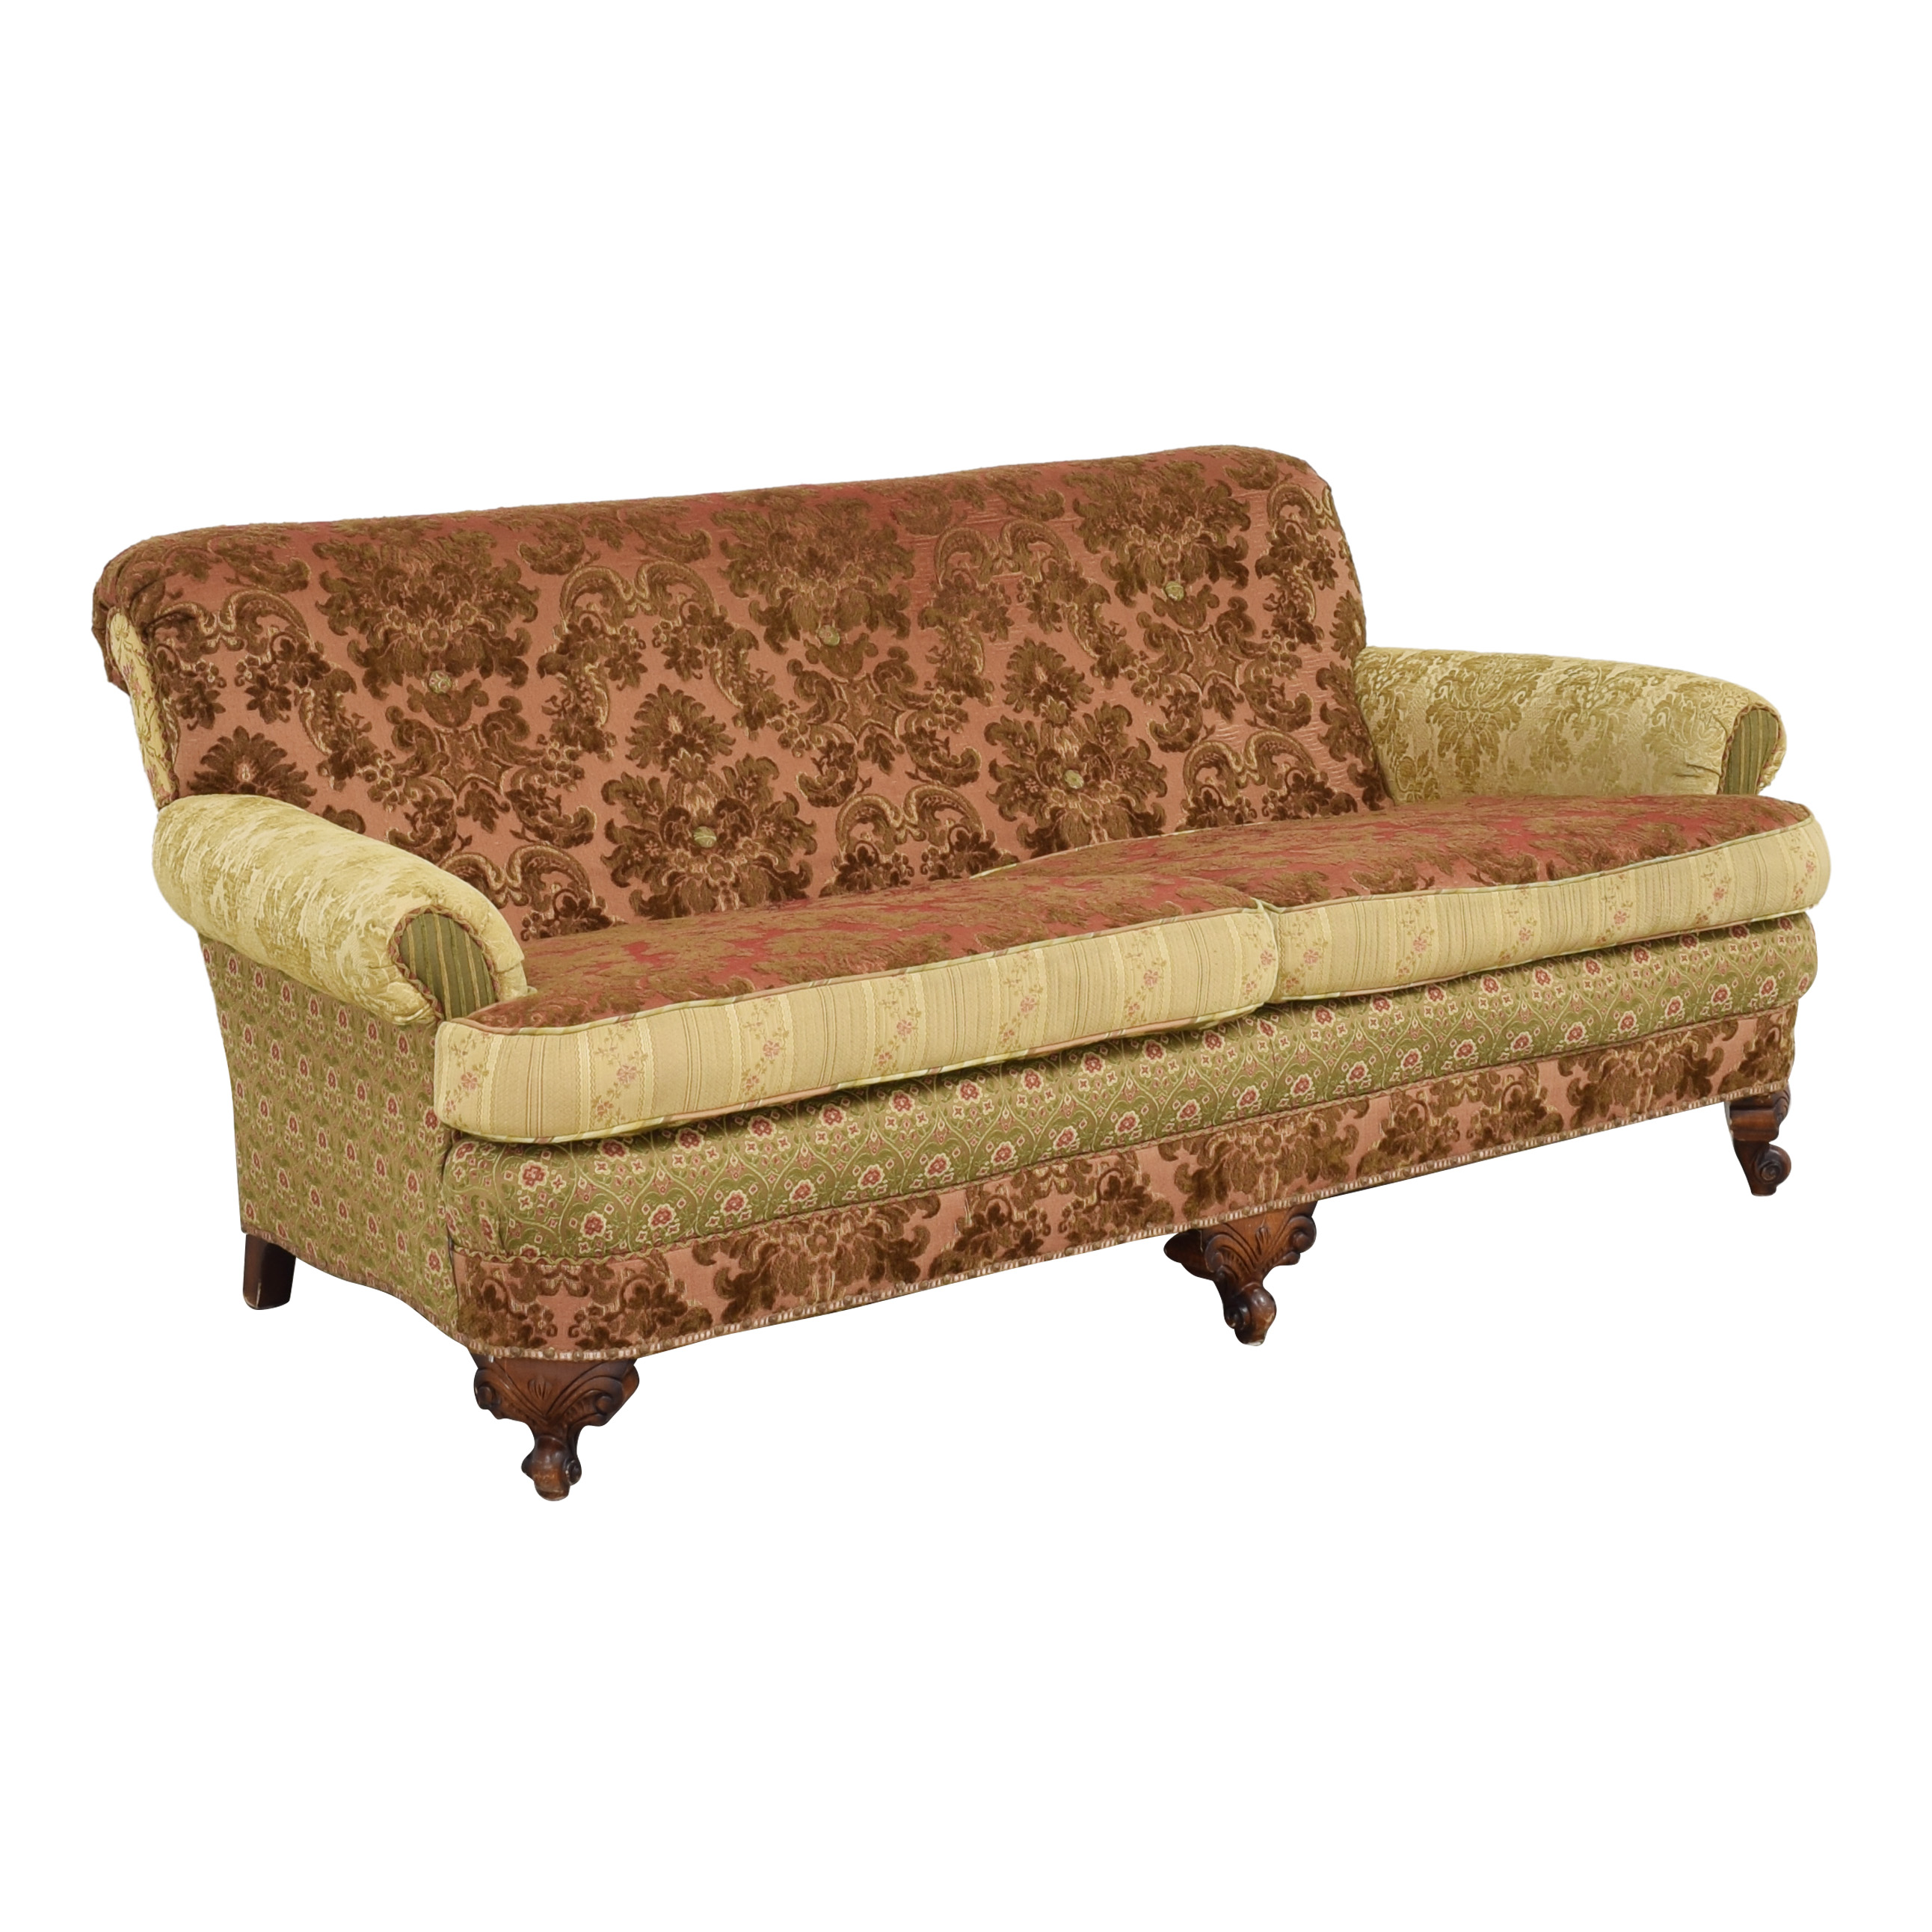 buy Key City Jeff Zimmerman Victorian Sofa Key City Furniture Sofas